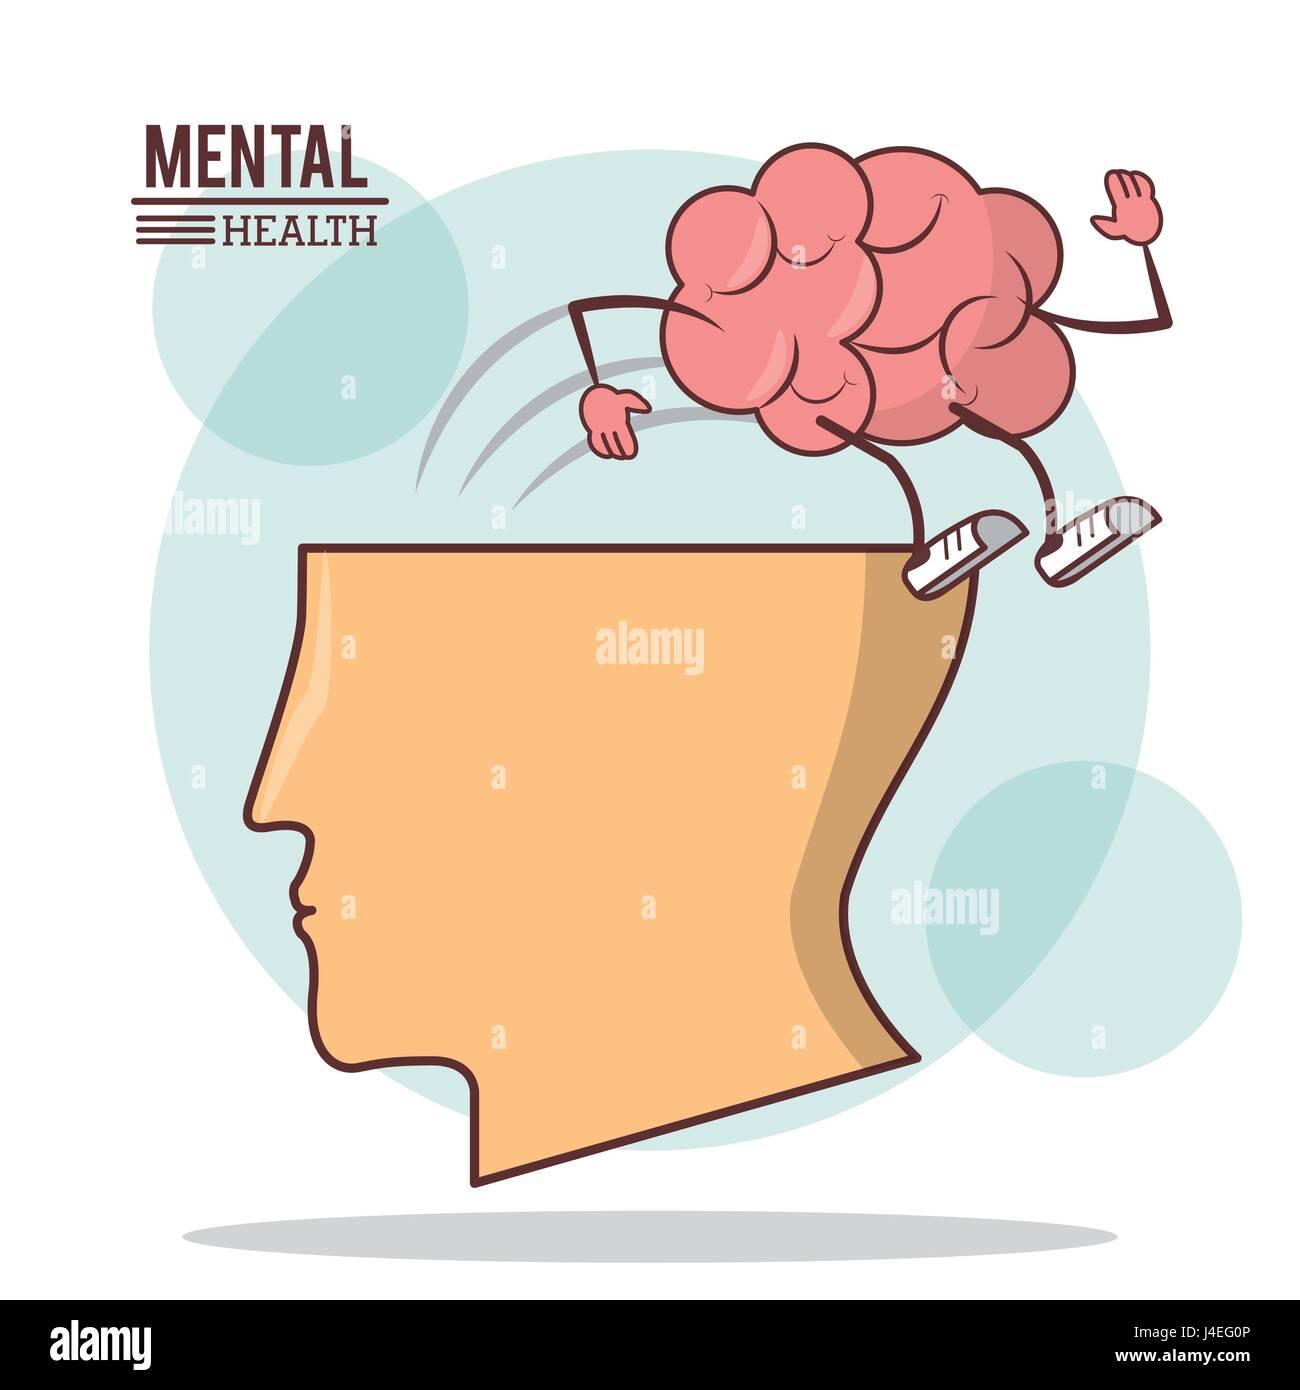 human head brain, mental health with brain activity care - Stock Image